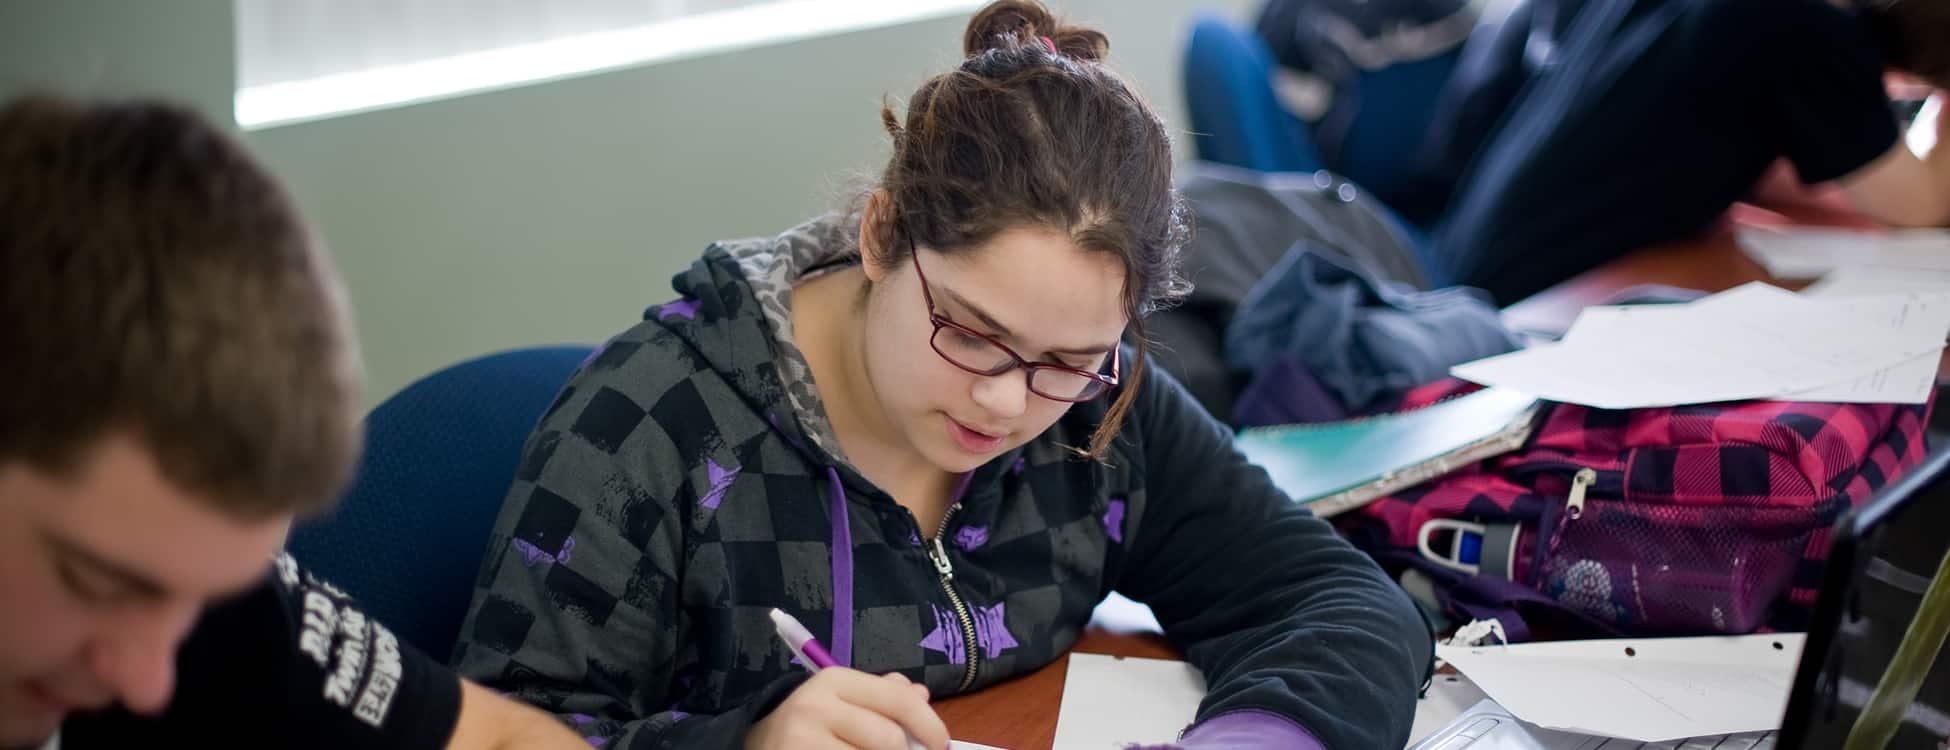 female student, studying, mathematics, classroom